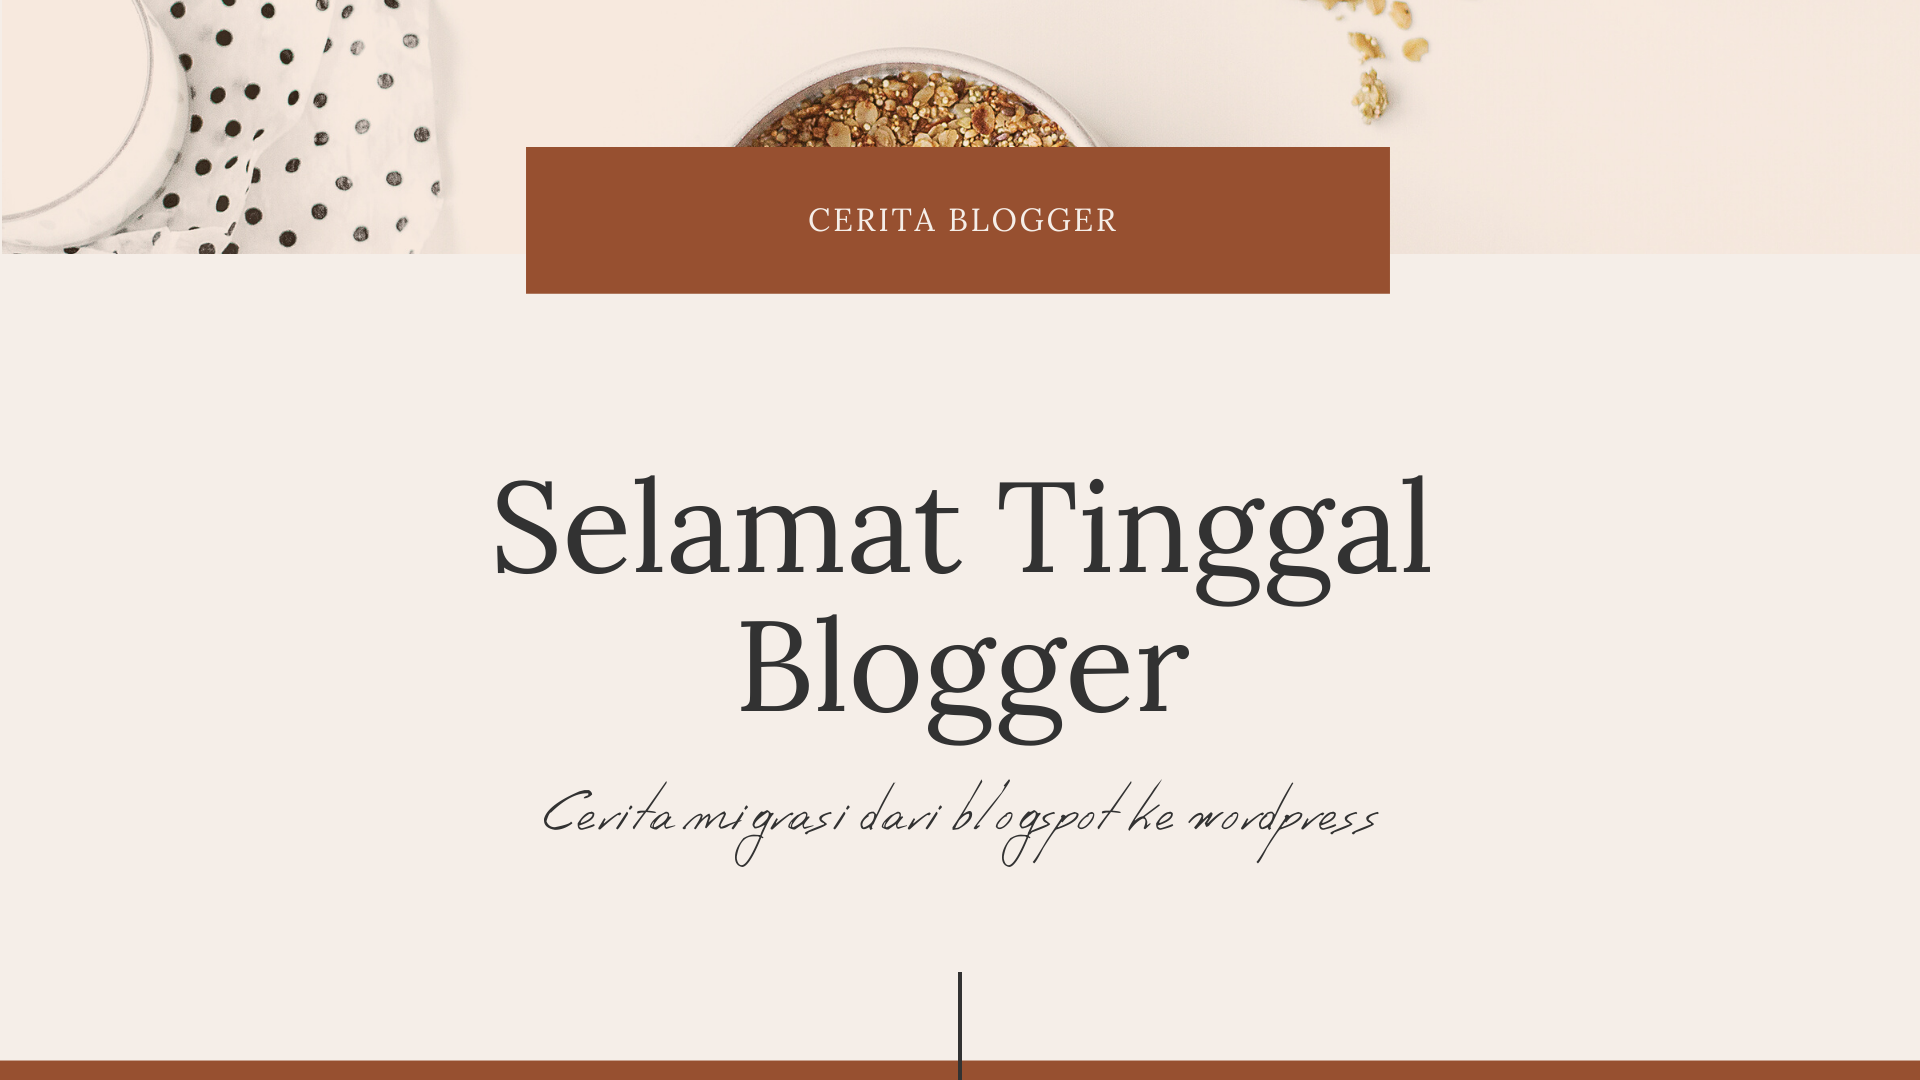 migrasi blogspot ke wordpress